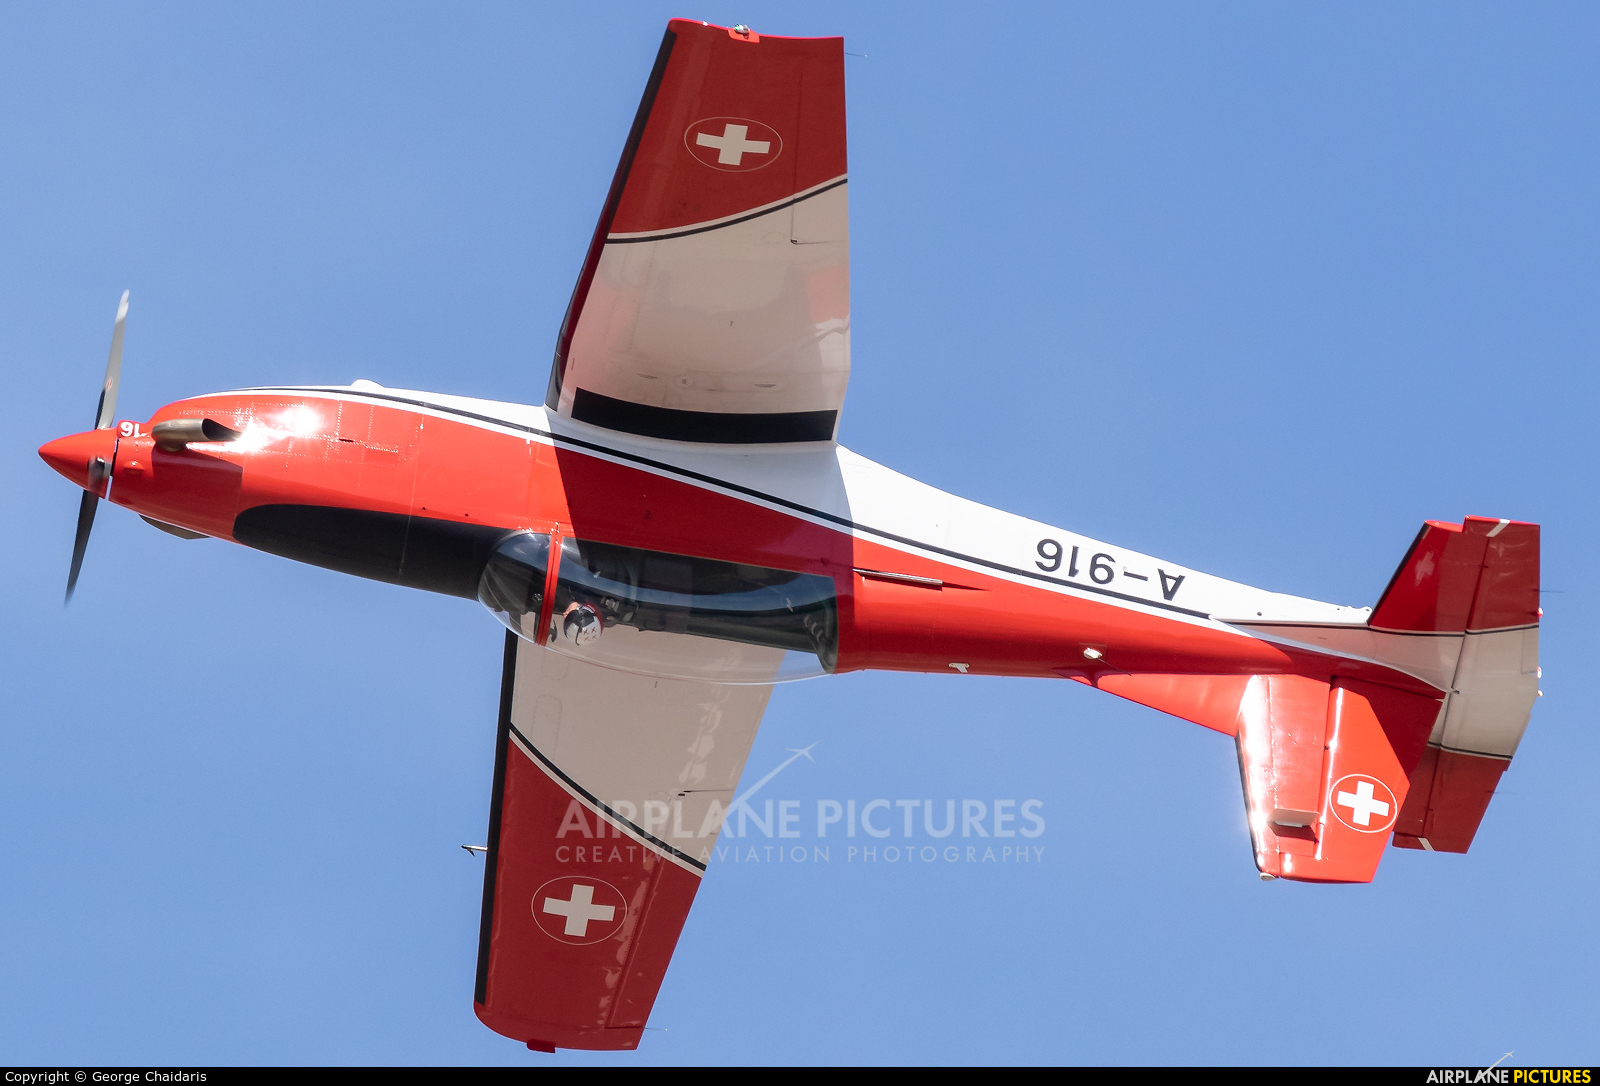 Switzerland - Air Force A-916 aircraft at Tanagra